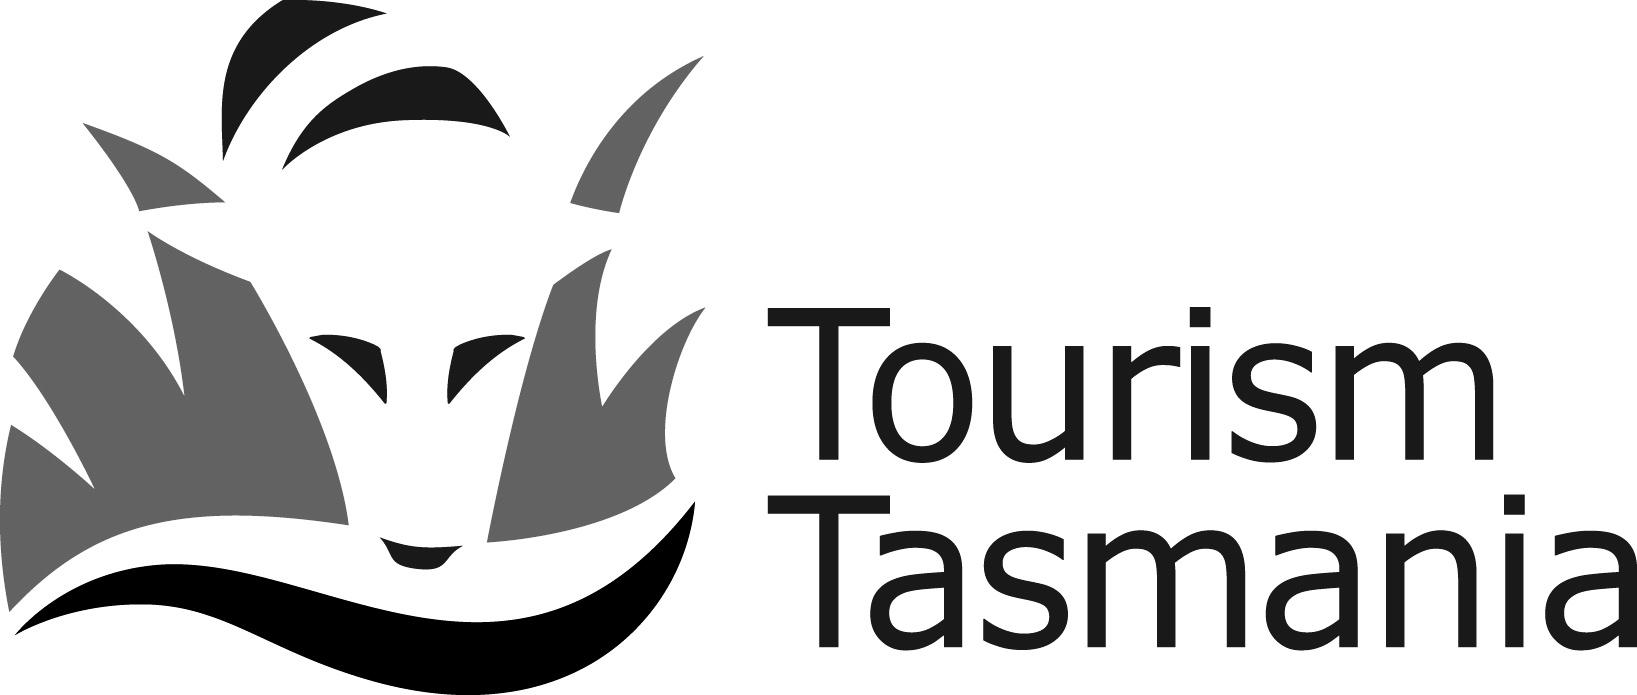 tourism_tasmania_contentleadersacademy.jpg